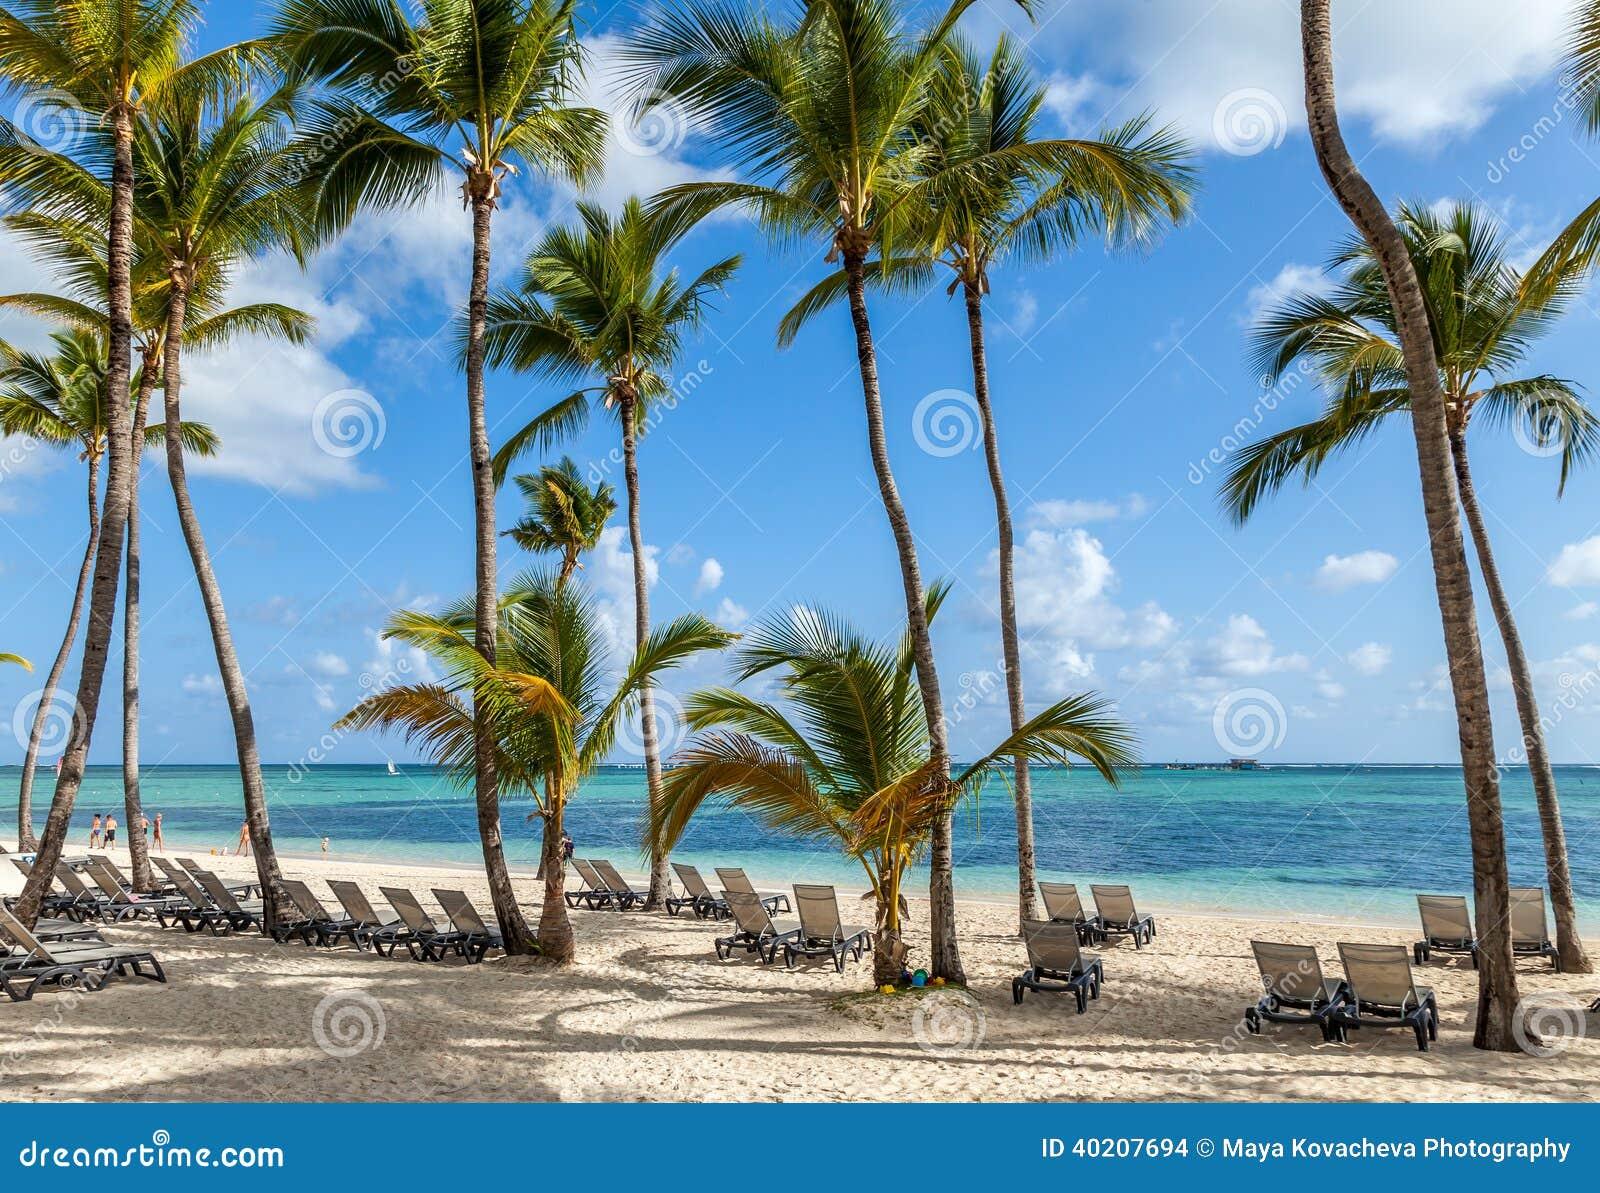 luxury resort beach in punta cana stock photo image. Black Bedroom Furniture Sets. Home Design Ideas